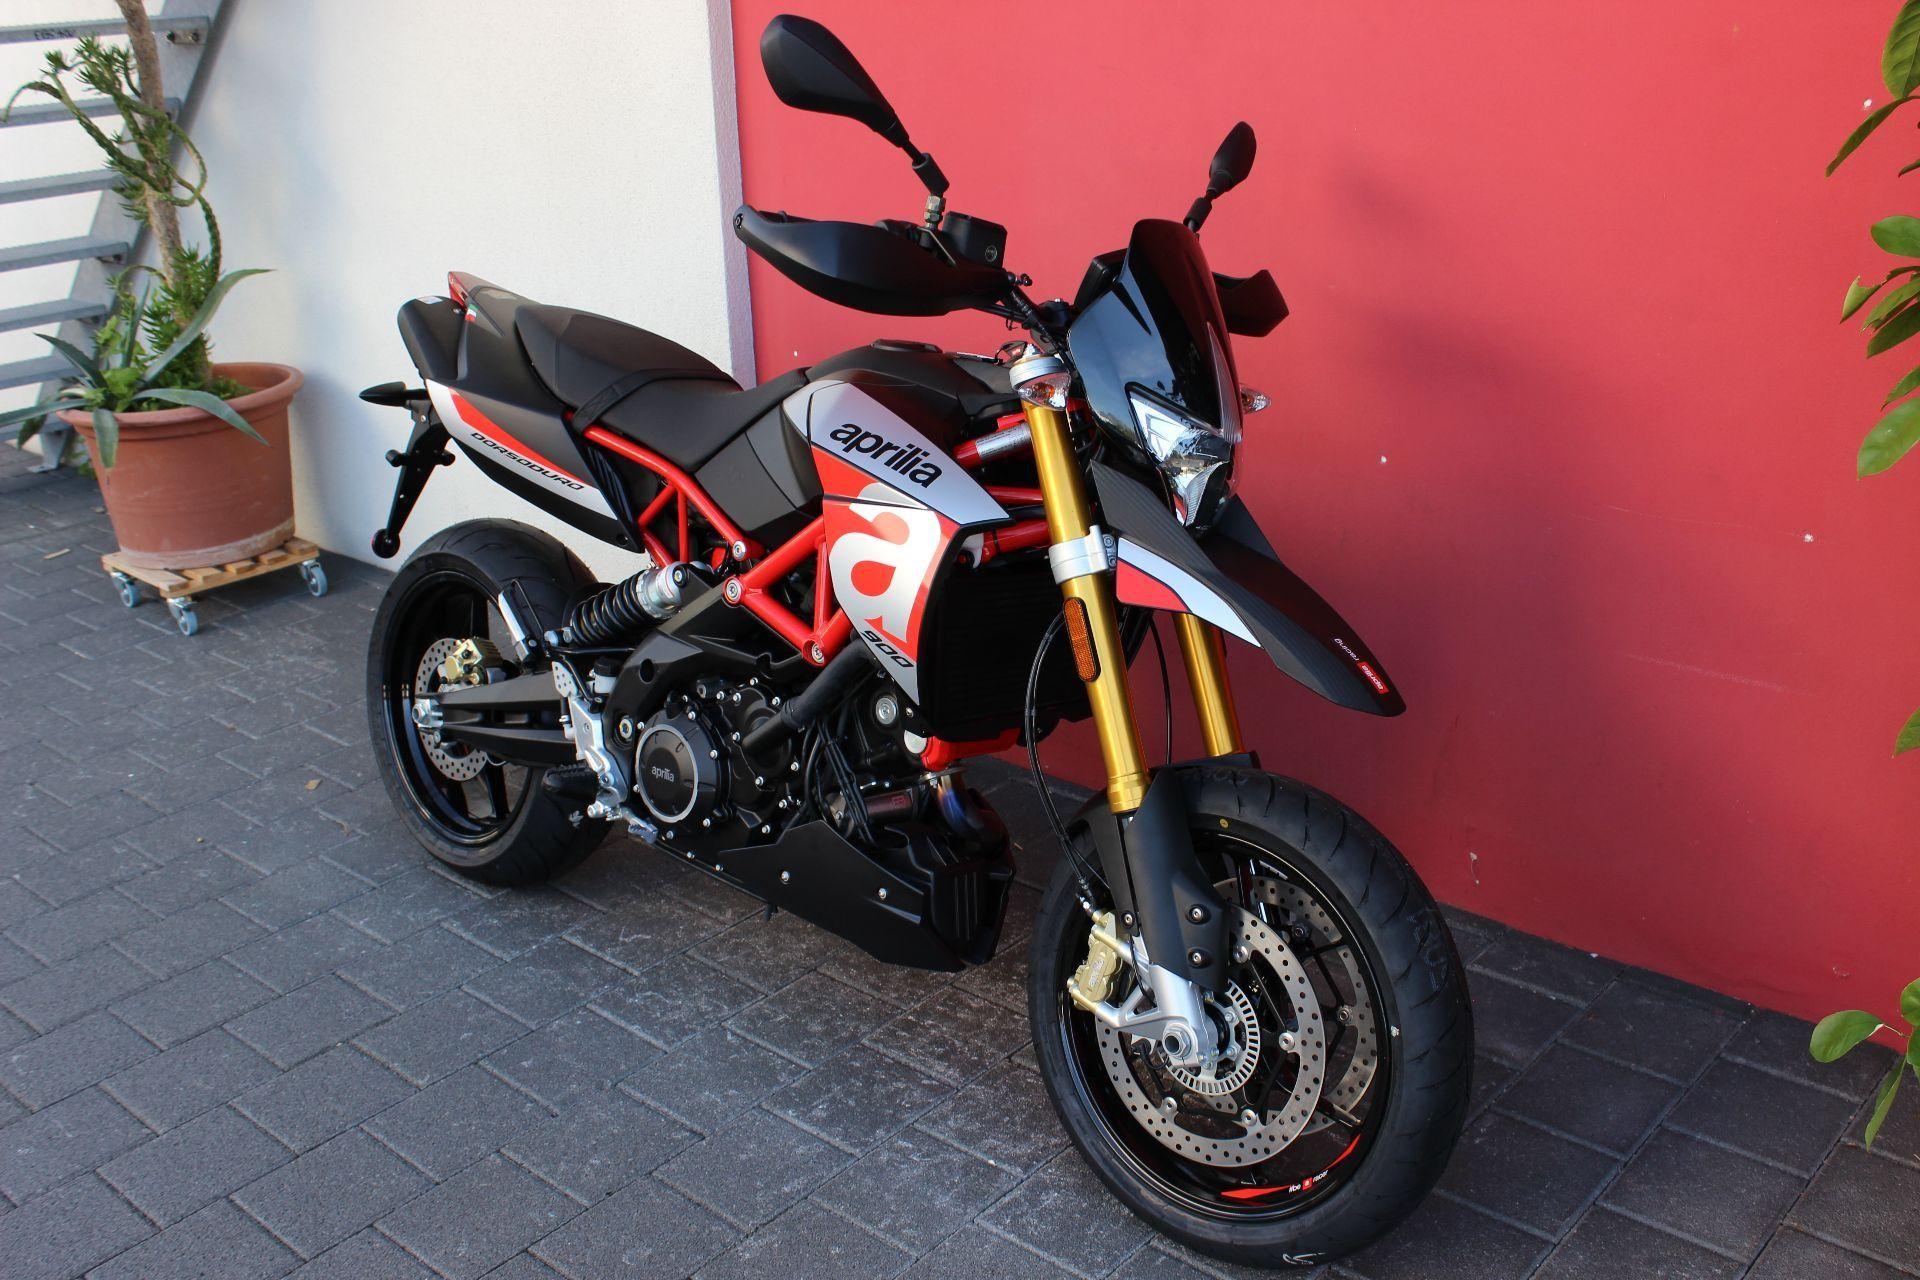 buy motorbike new vehicle bike aprilia dorsoduro 900 abs. Black Bedroom Furniture Sets. Home Design Ideas